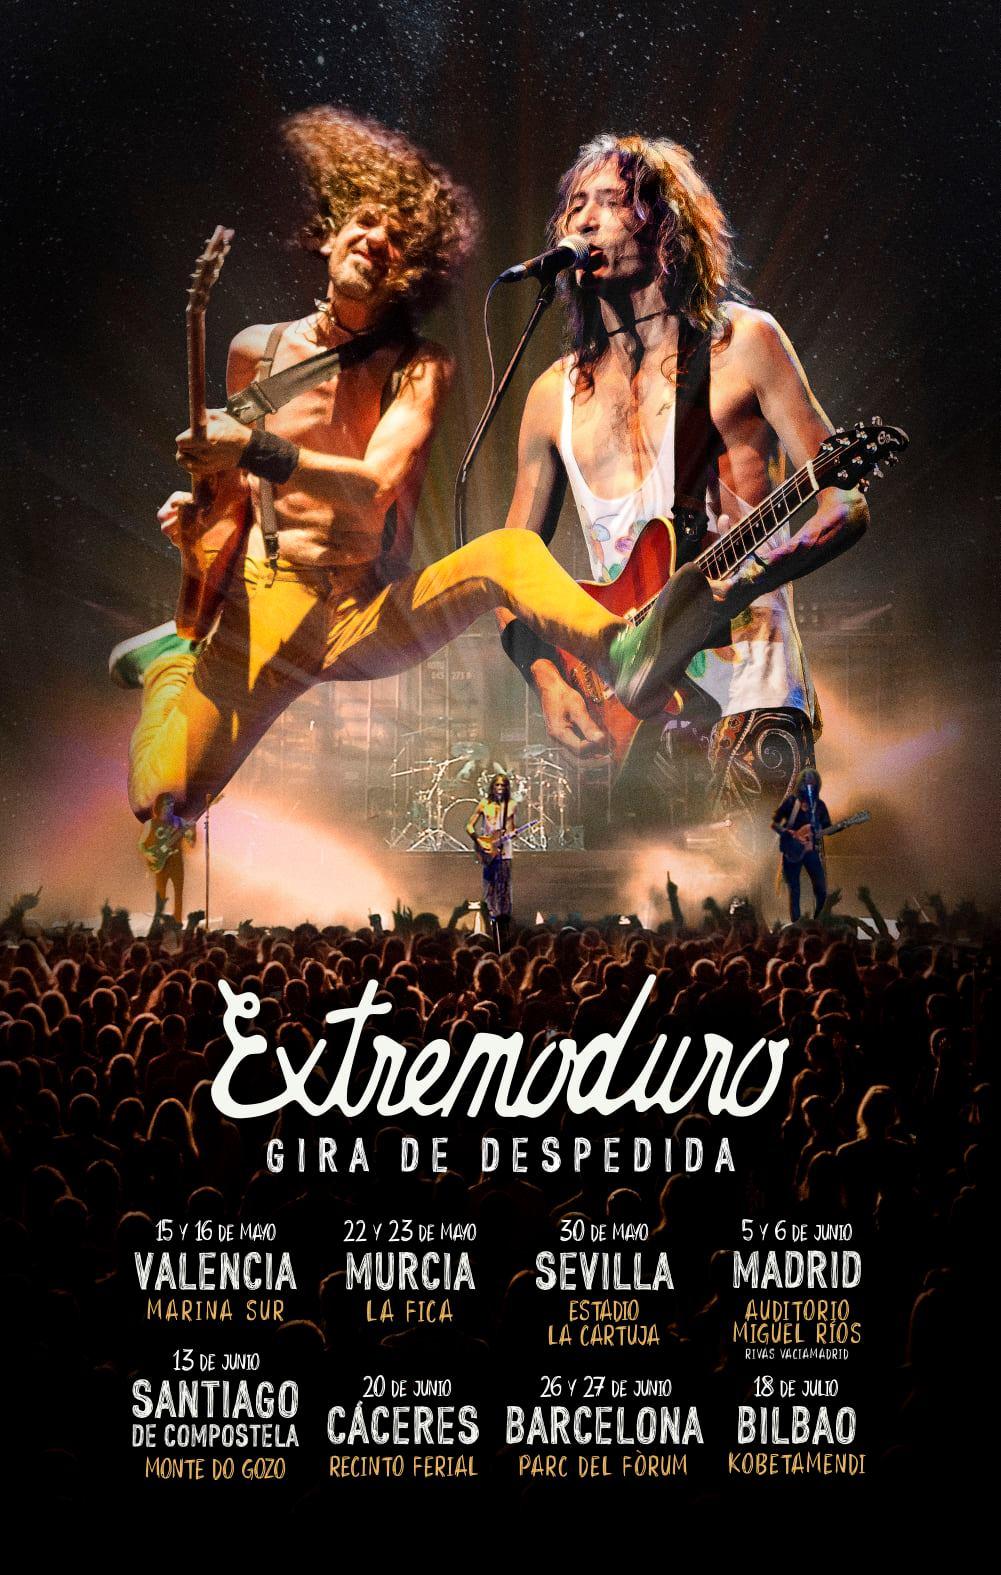 extremoduro gira despedida 2020 madrid concierto cartel